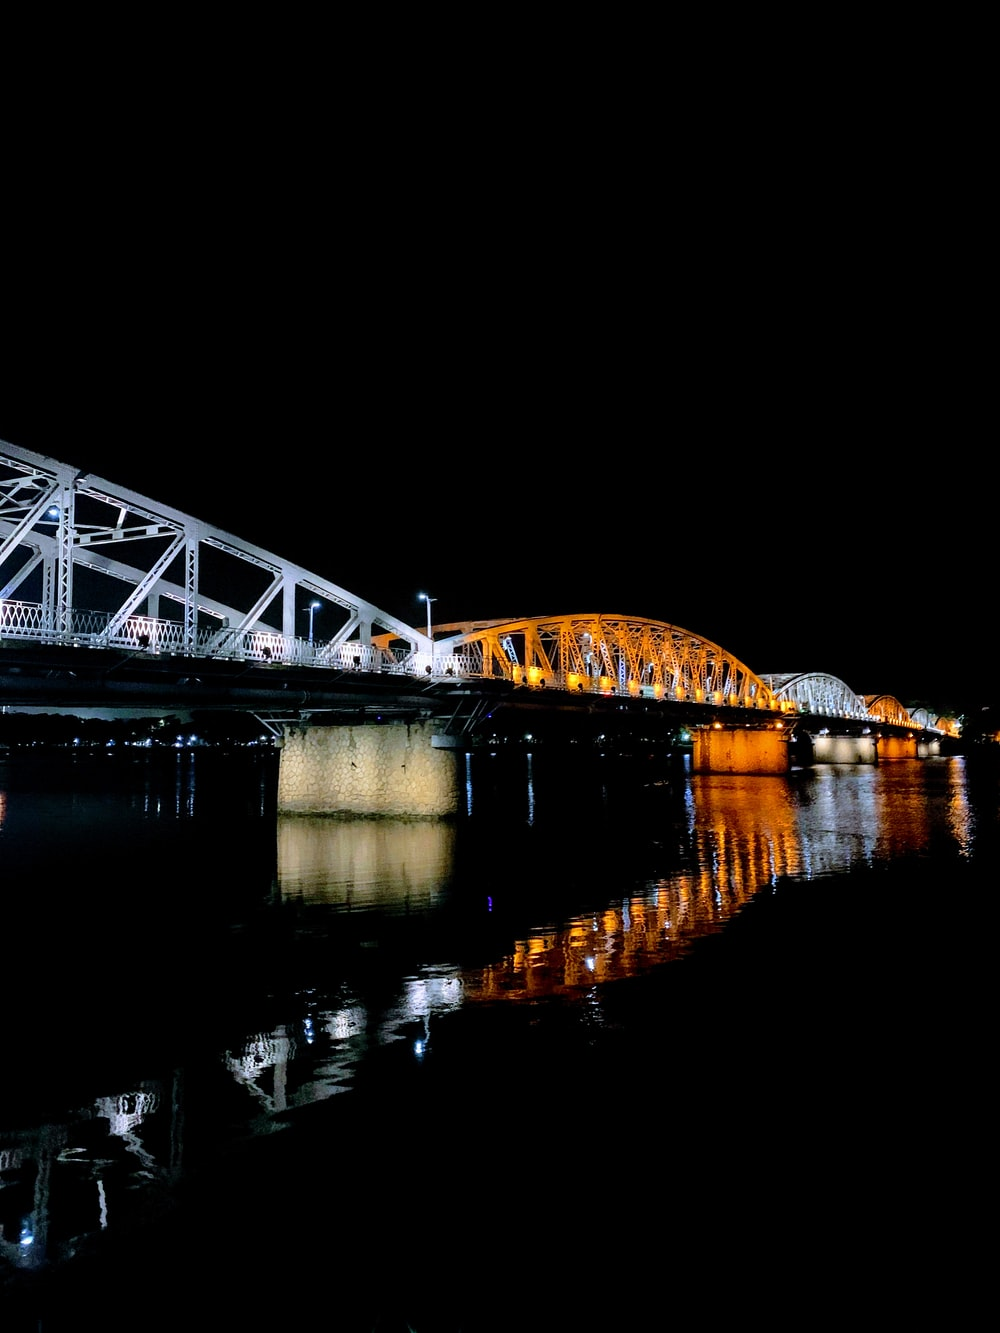 white and orange steel bridge during night time